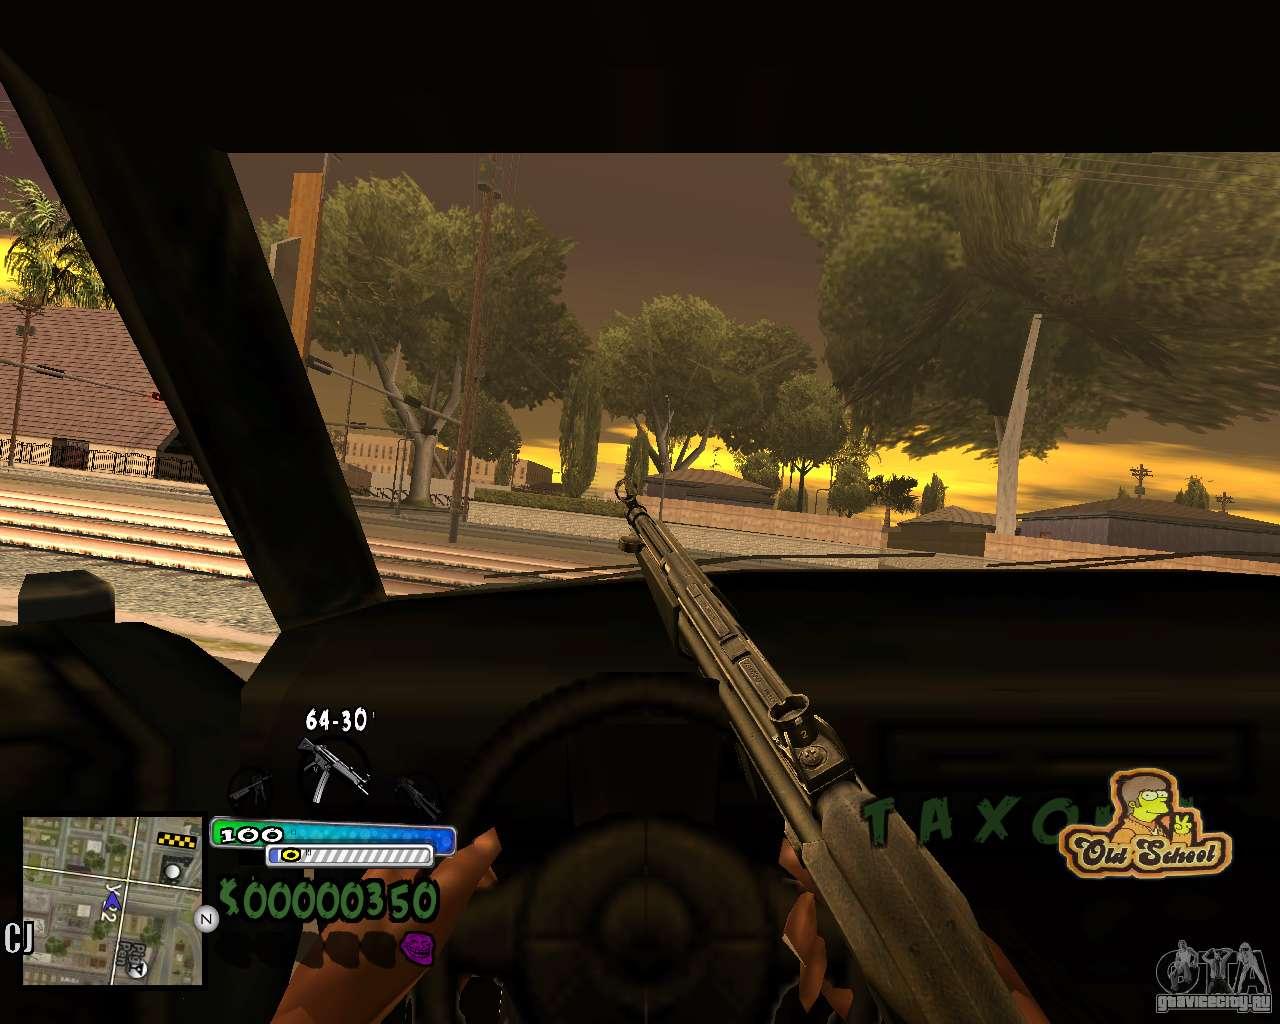 Вид от первого лица (first-person mod) для gta san andreas.